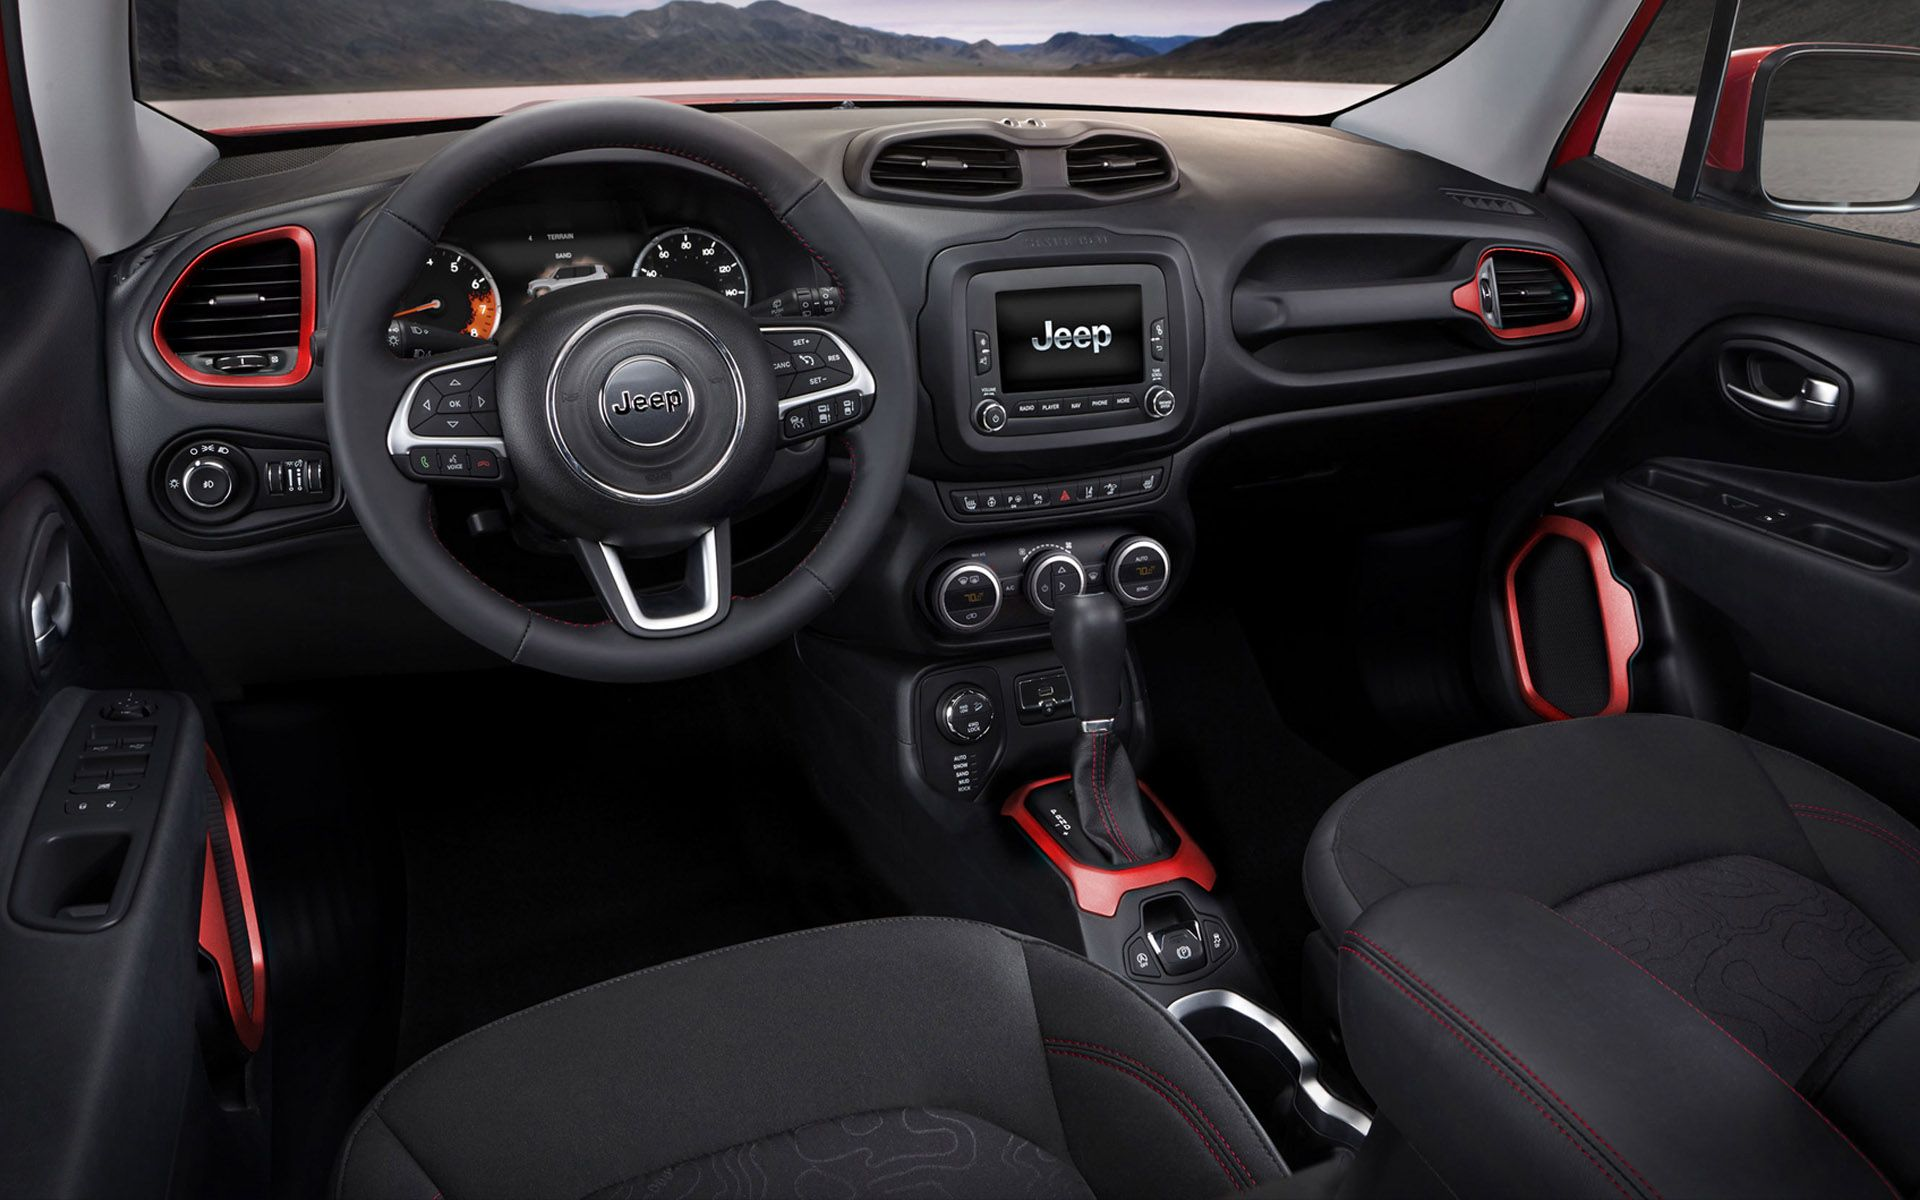 2015 Jeep Renegade Interior Dashboard Image Wallpaper Jeep Renegade Auto Bild Autos